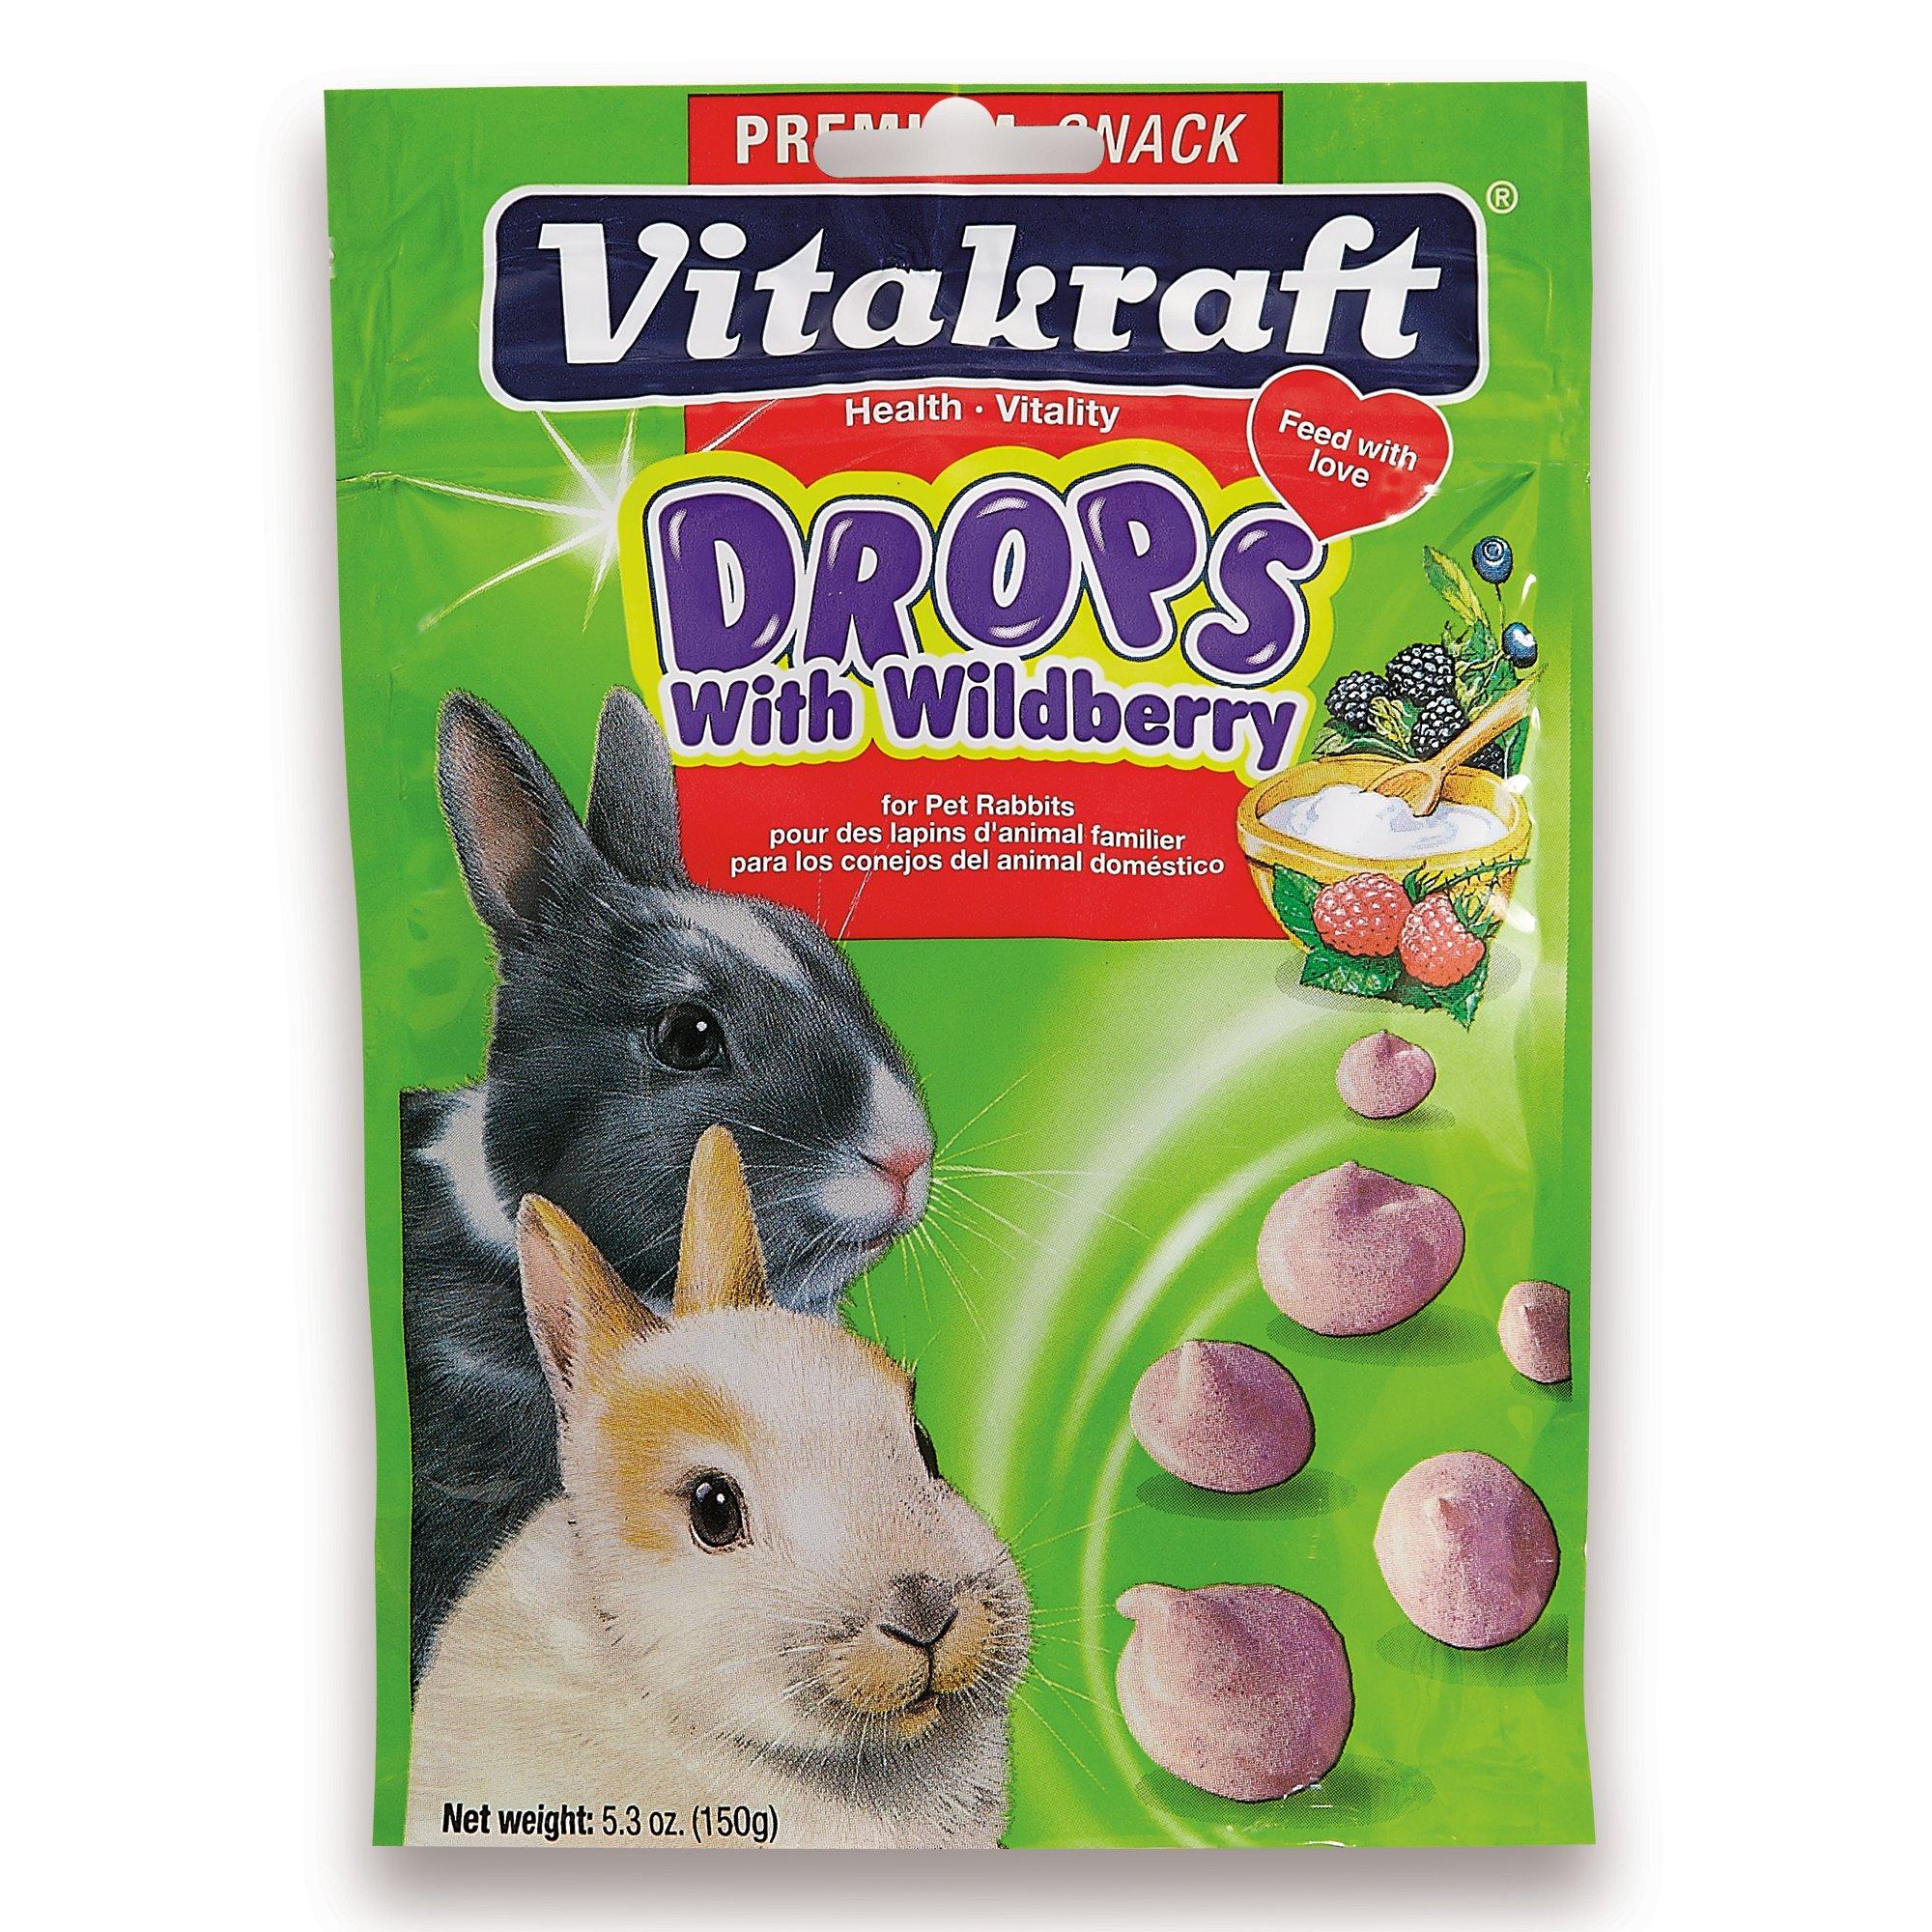 Vitakraft Drops with Wildberry Rabbit Treats   Petco at Petco in Braselton, GA   Tuggl